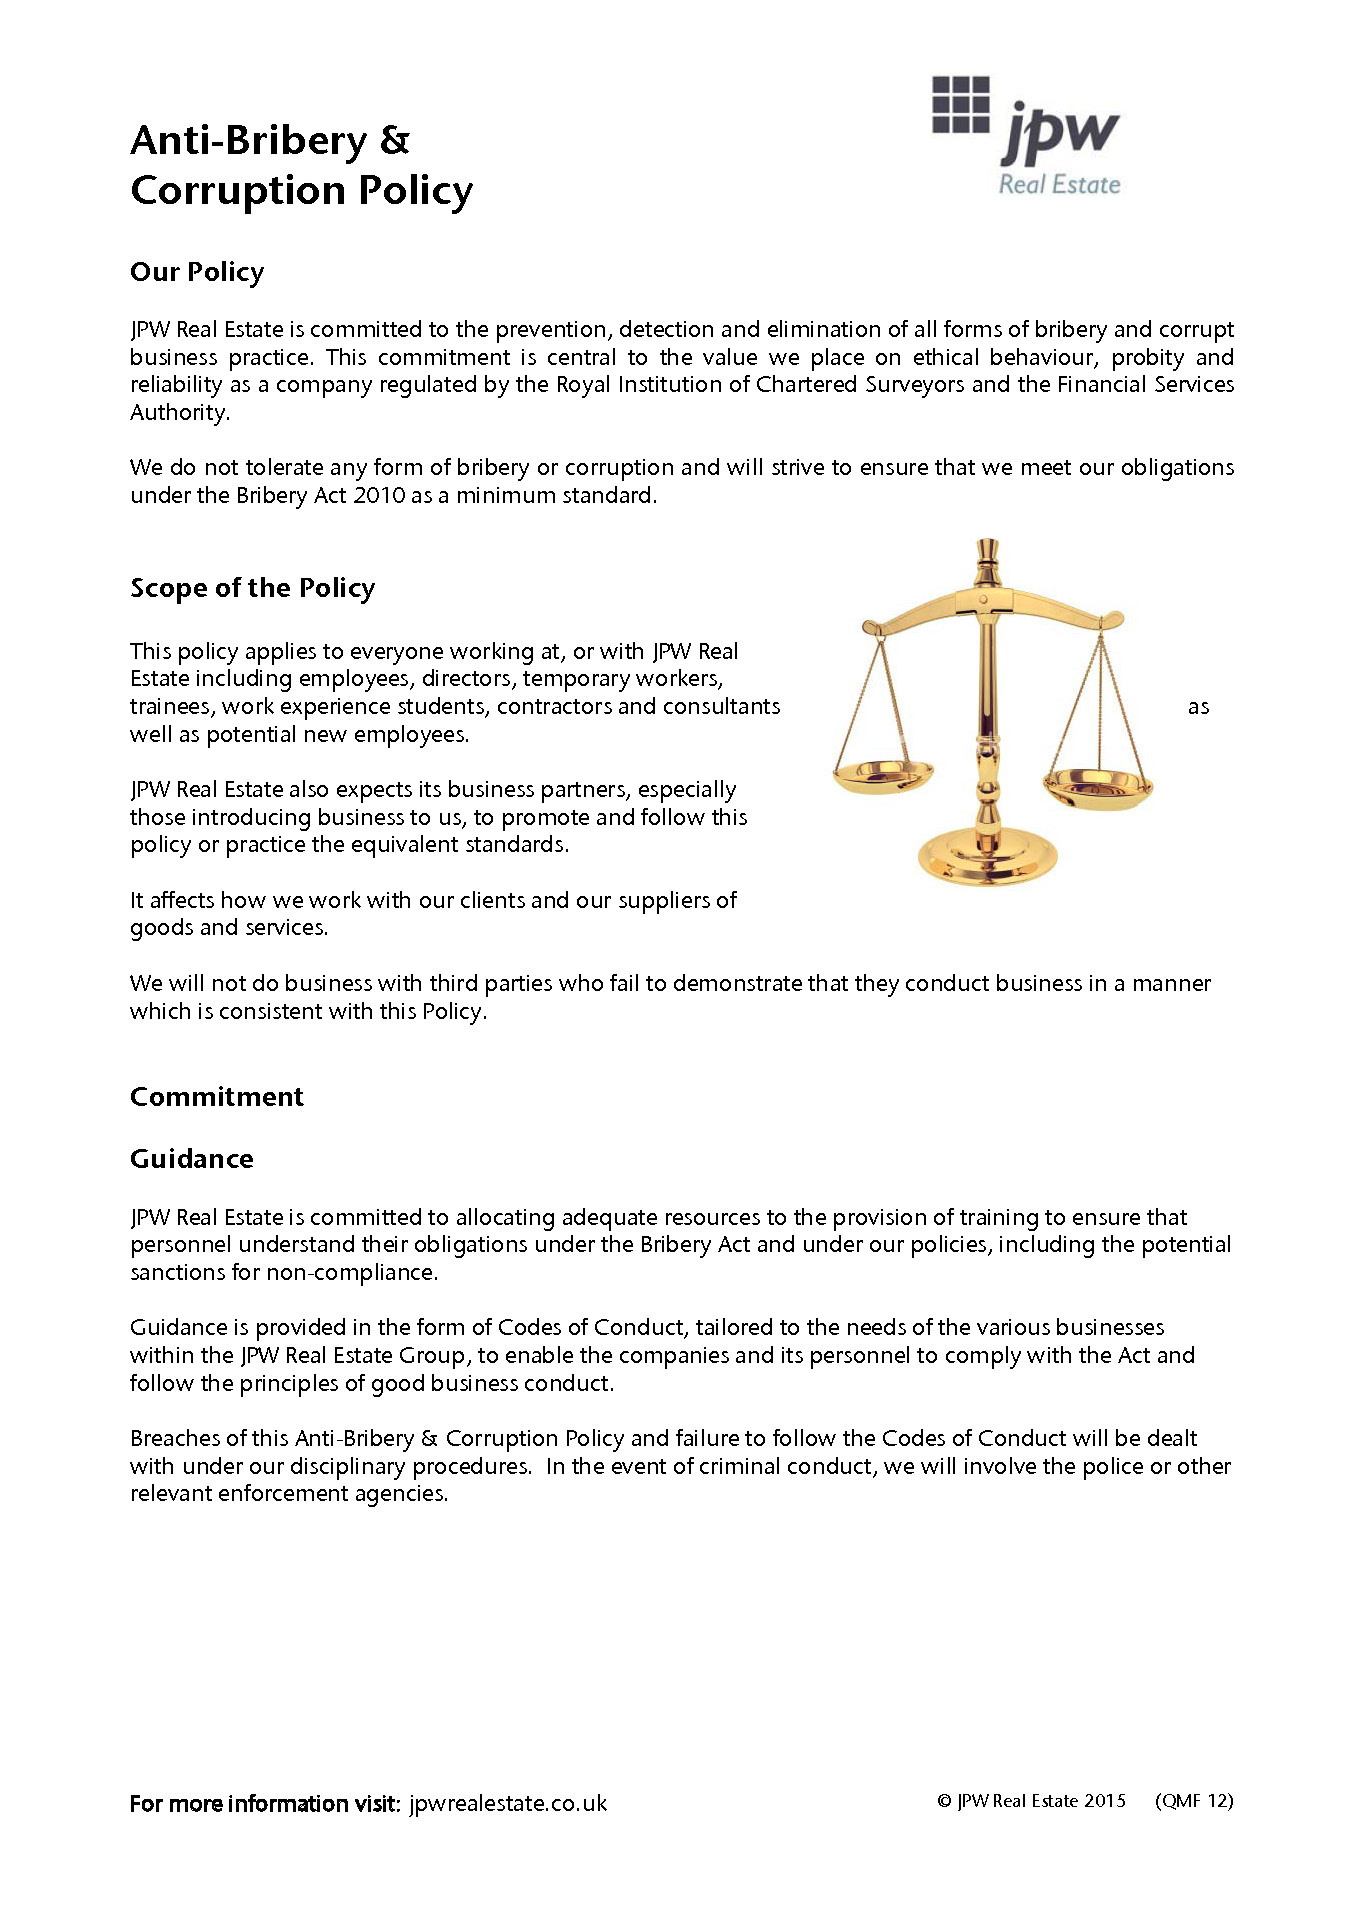 Jpw Anti Bribery Policy 2015 Page 1